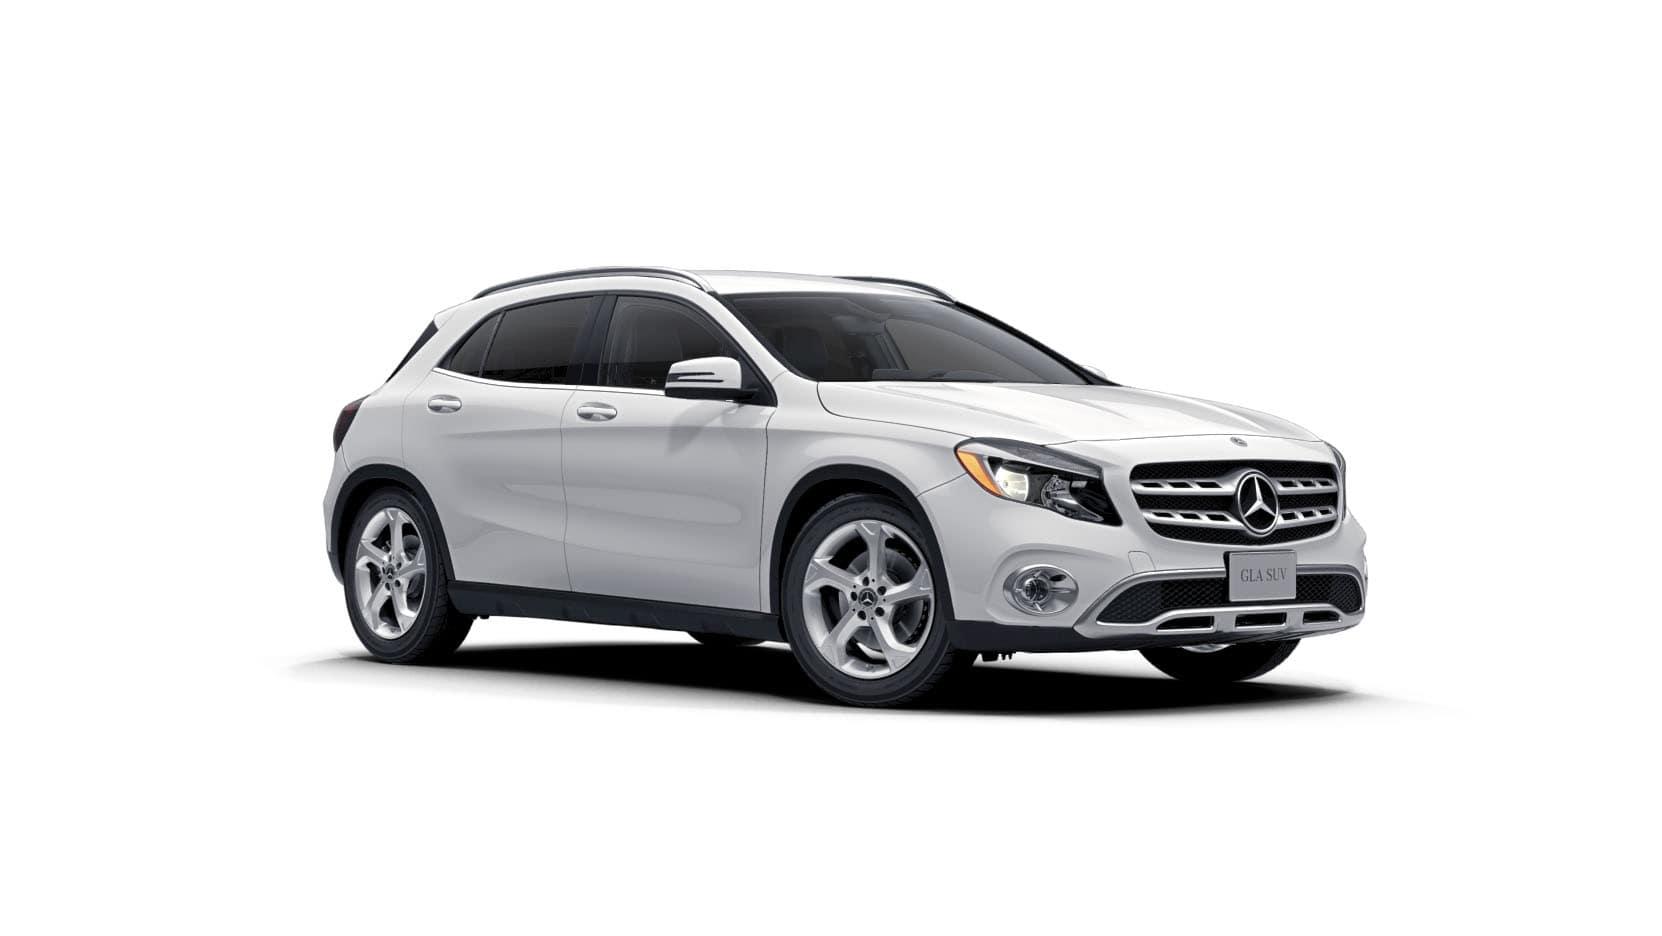 Mercedes-Benz GLA 250 4MATIC SUV